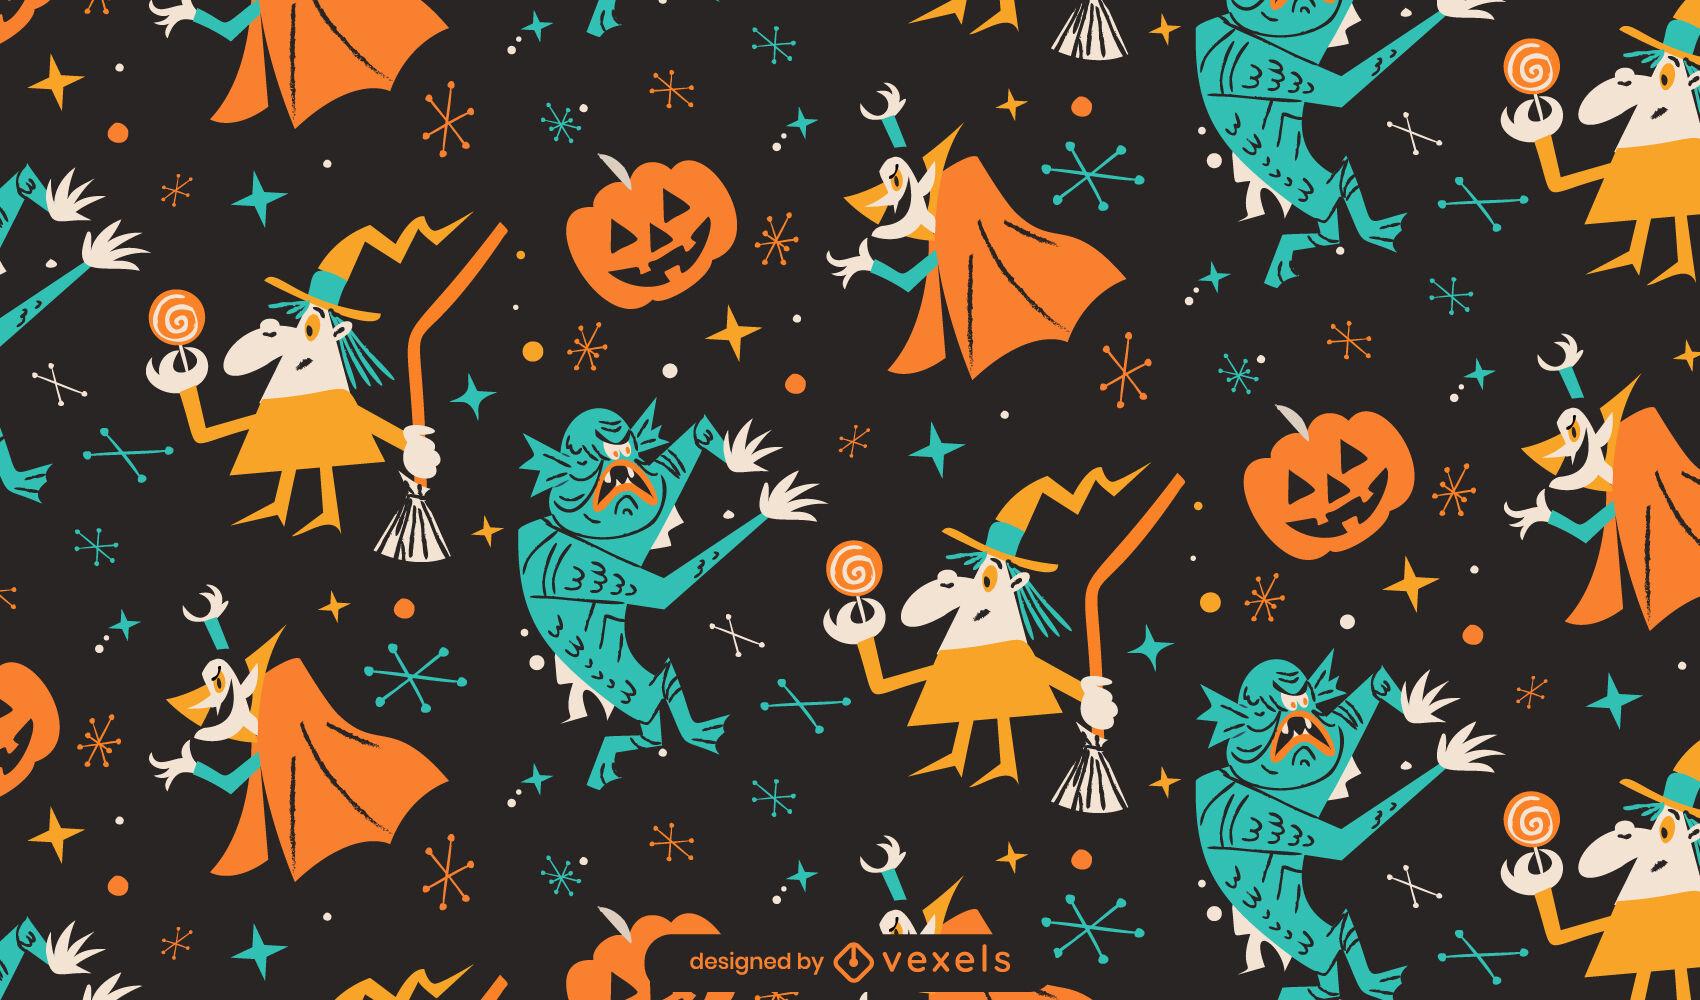 Patr?n de dibujos animados retro de monstruos de Halloween